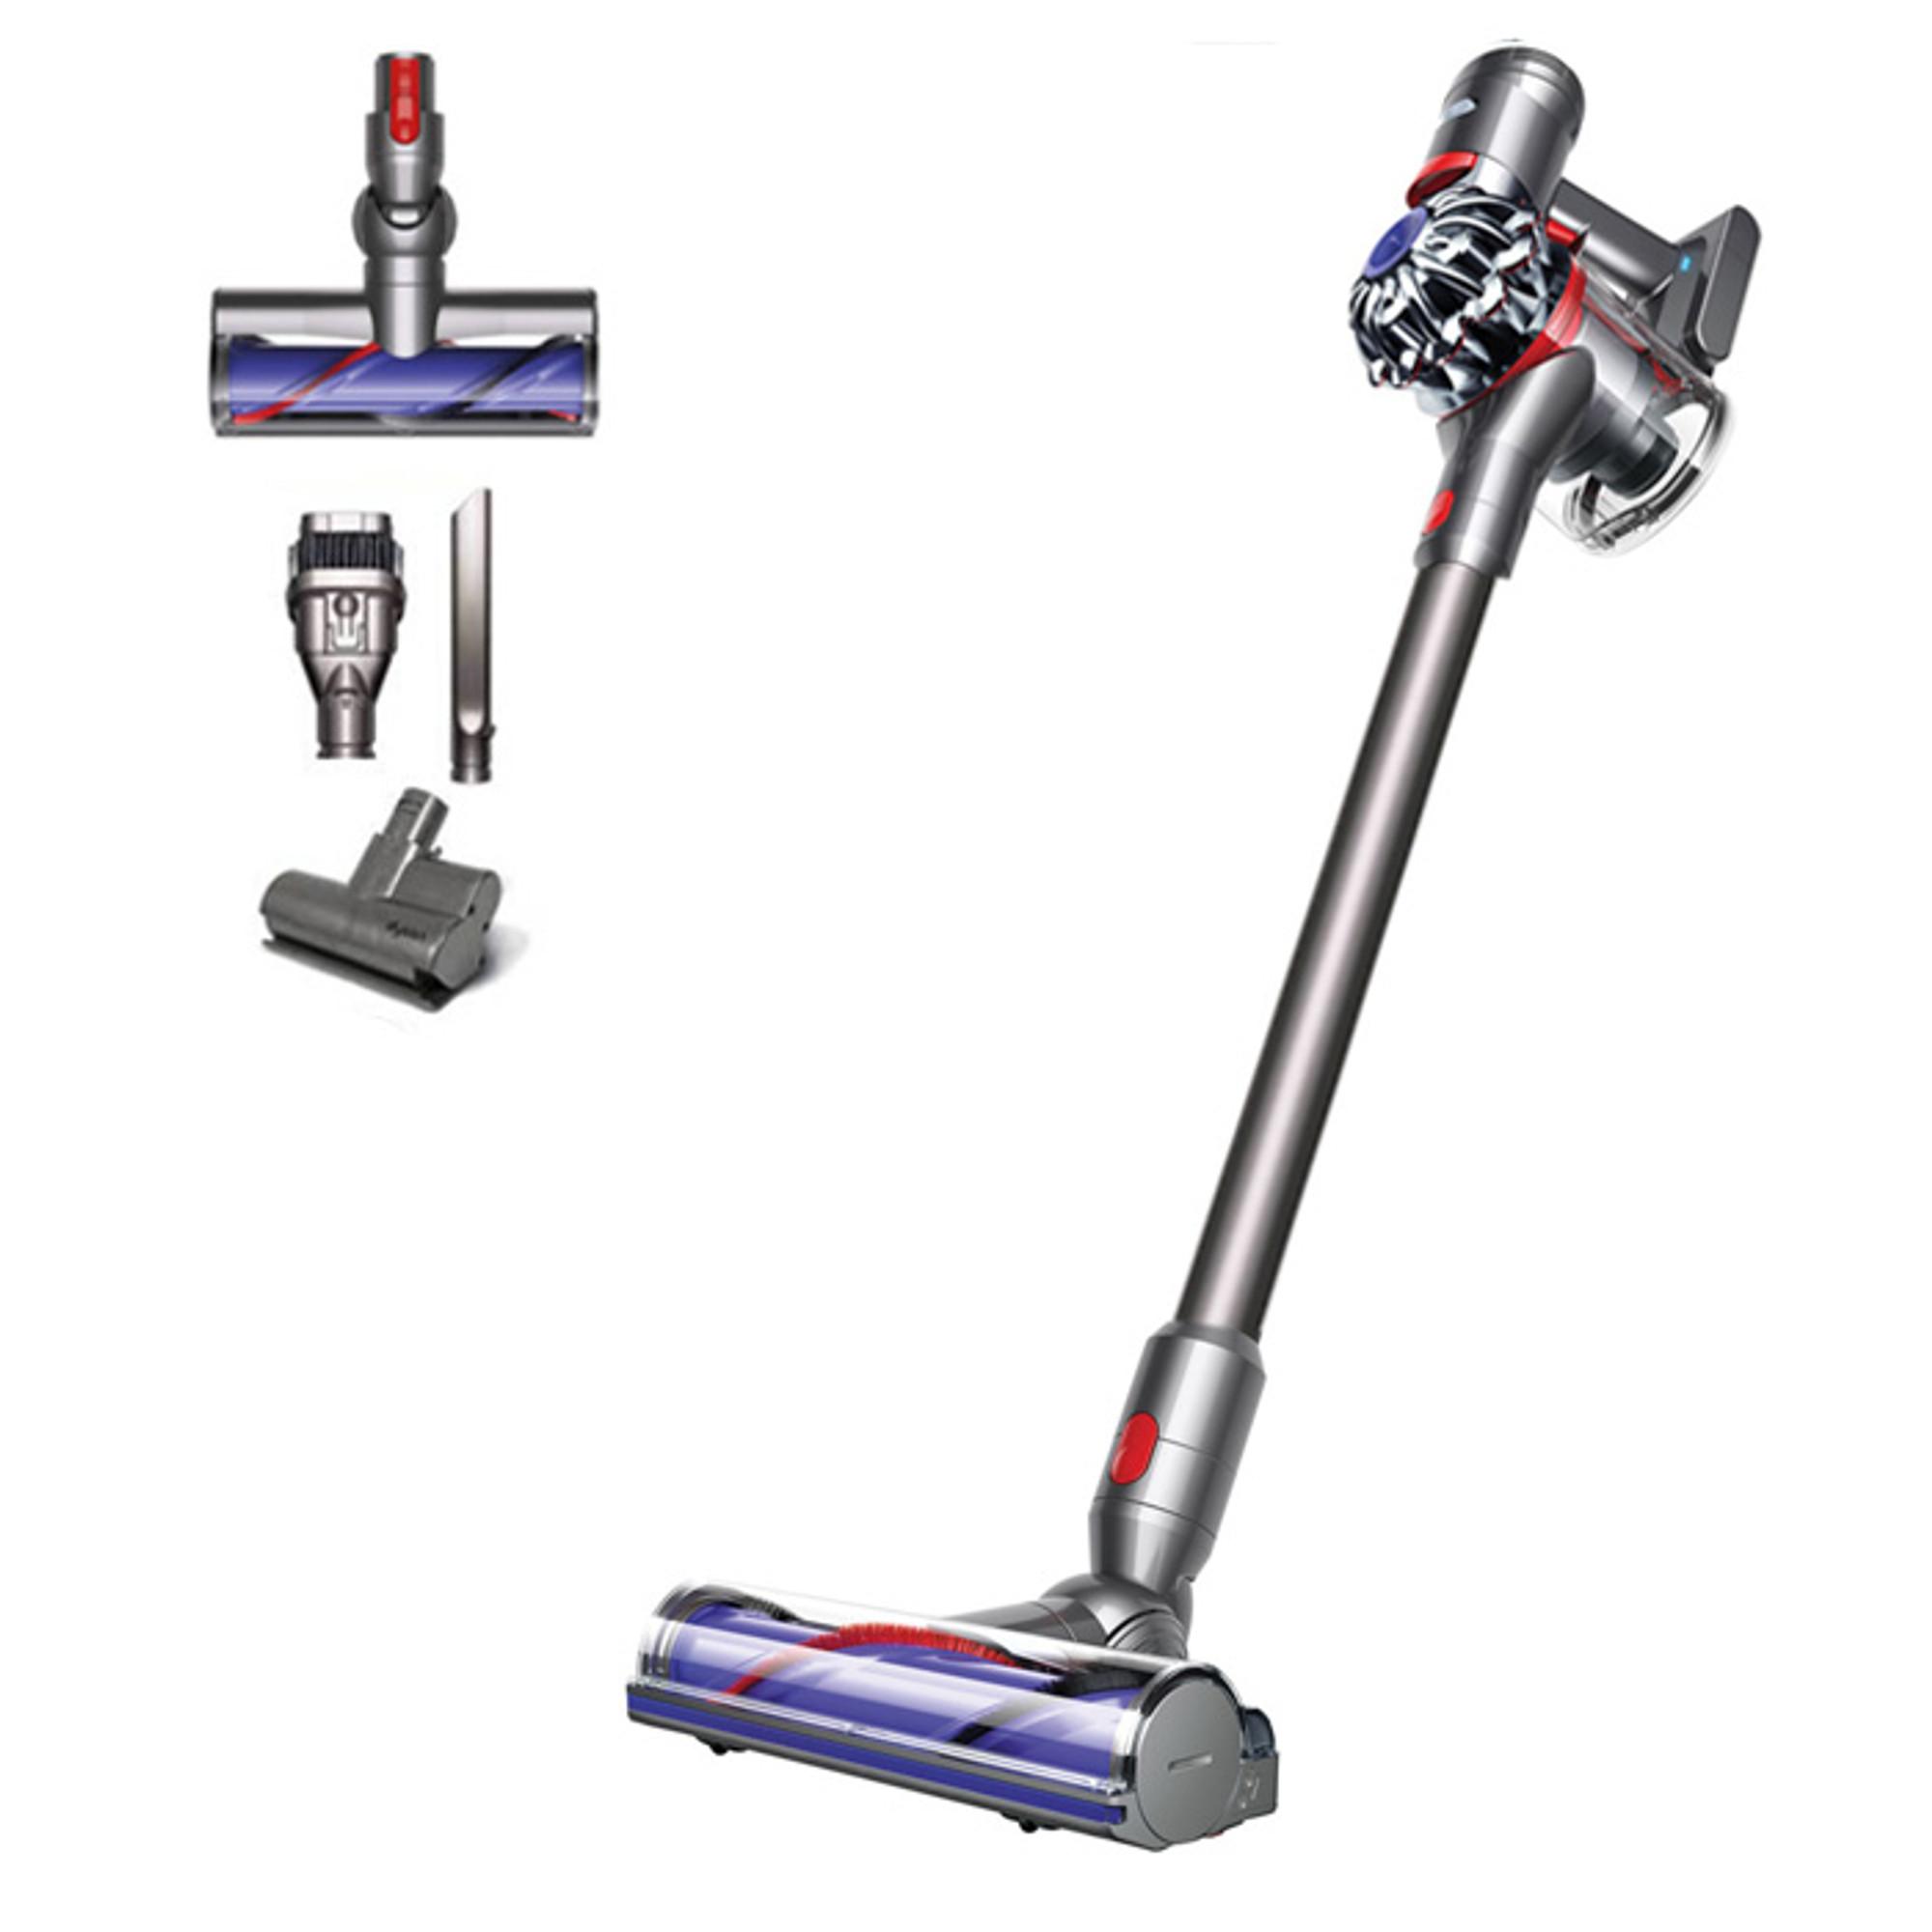 Buy Dyson V7 Animal Extra Cordless Vacuum from Canada at